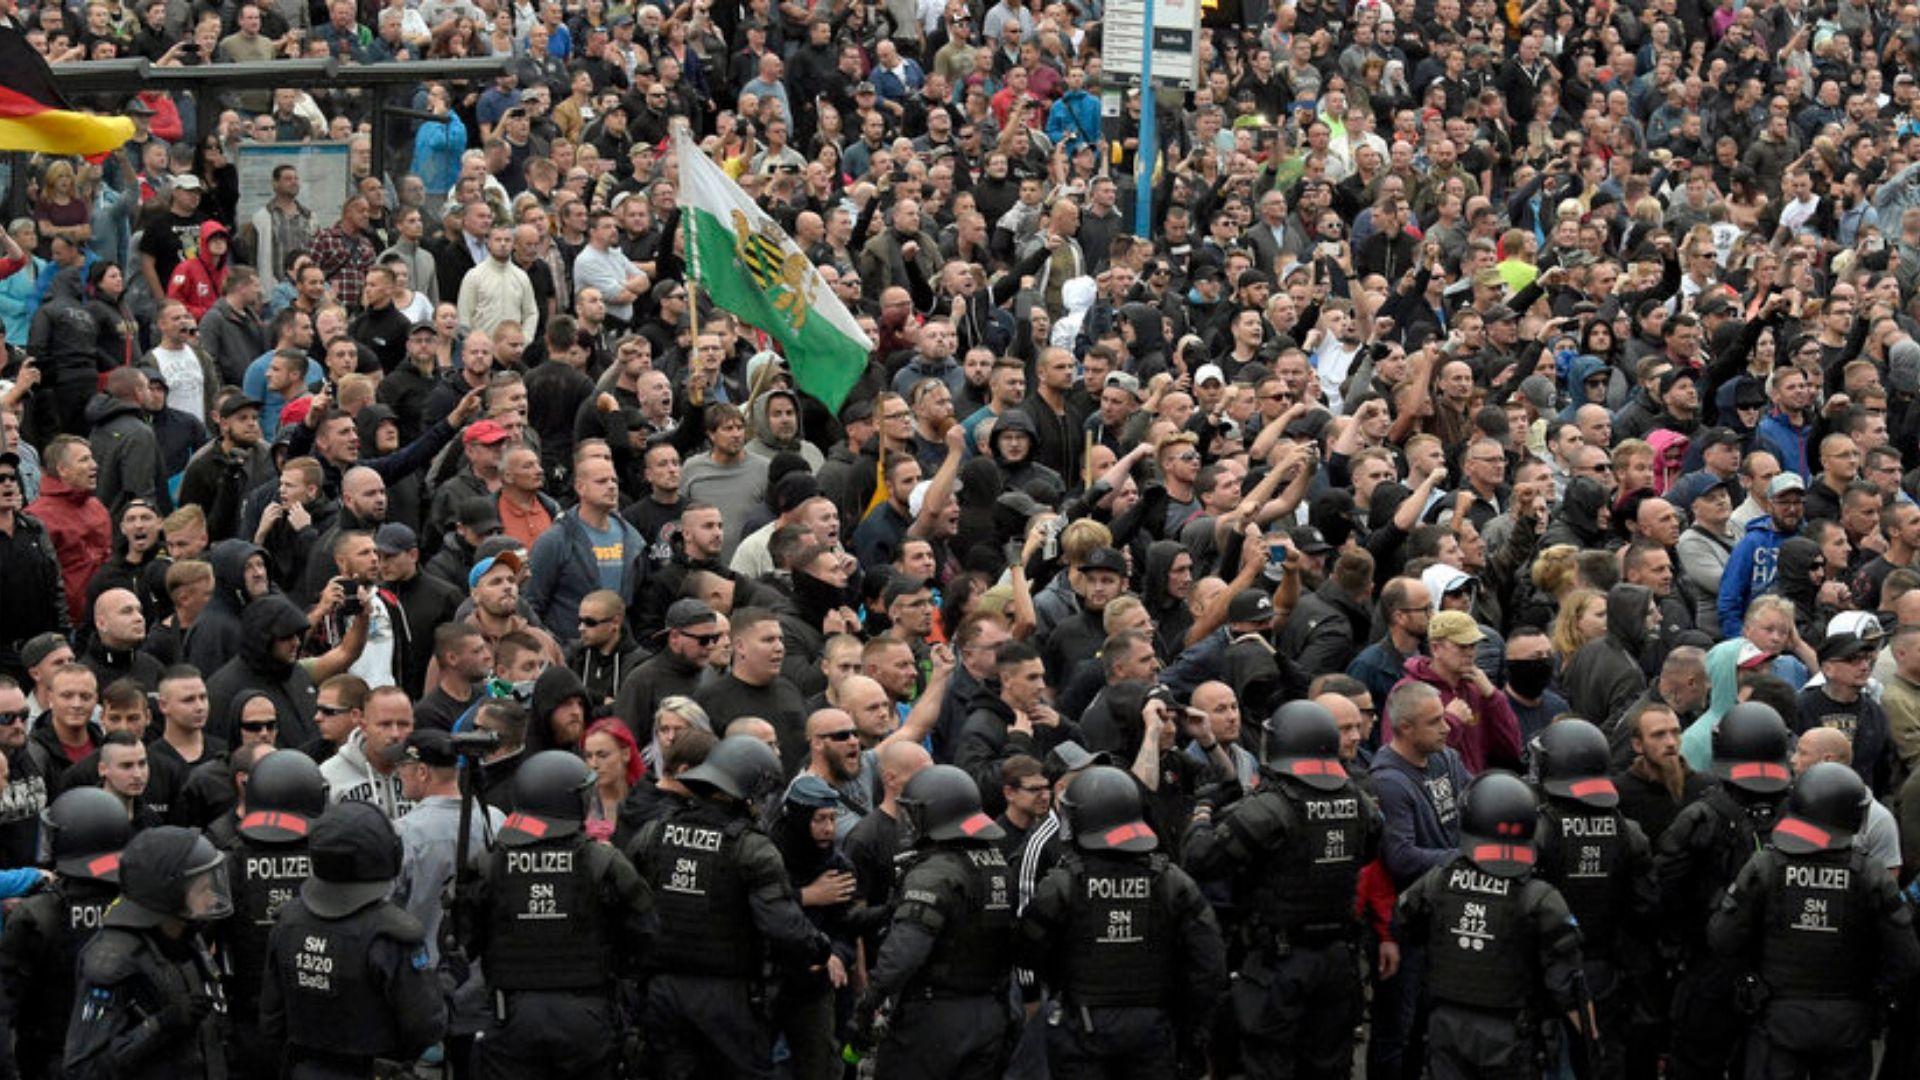 Germania, Dresda proclama lo